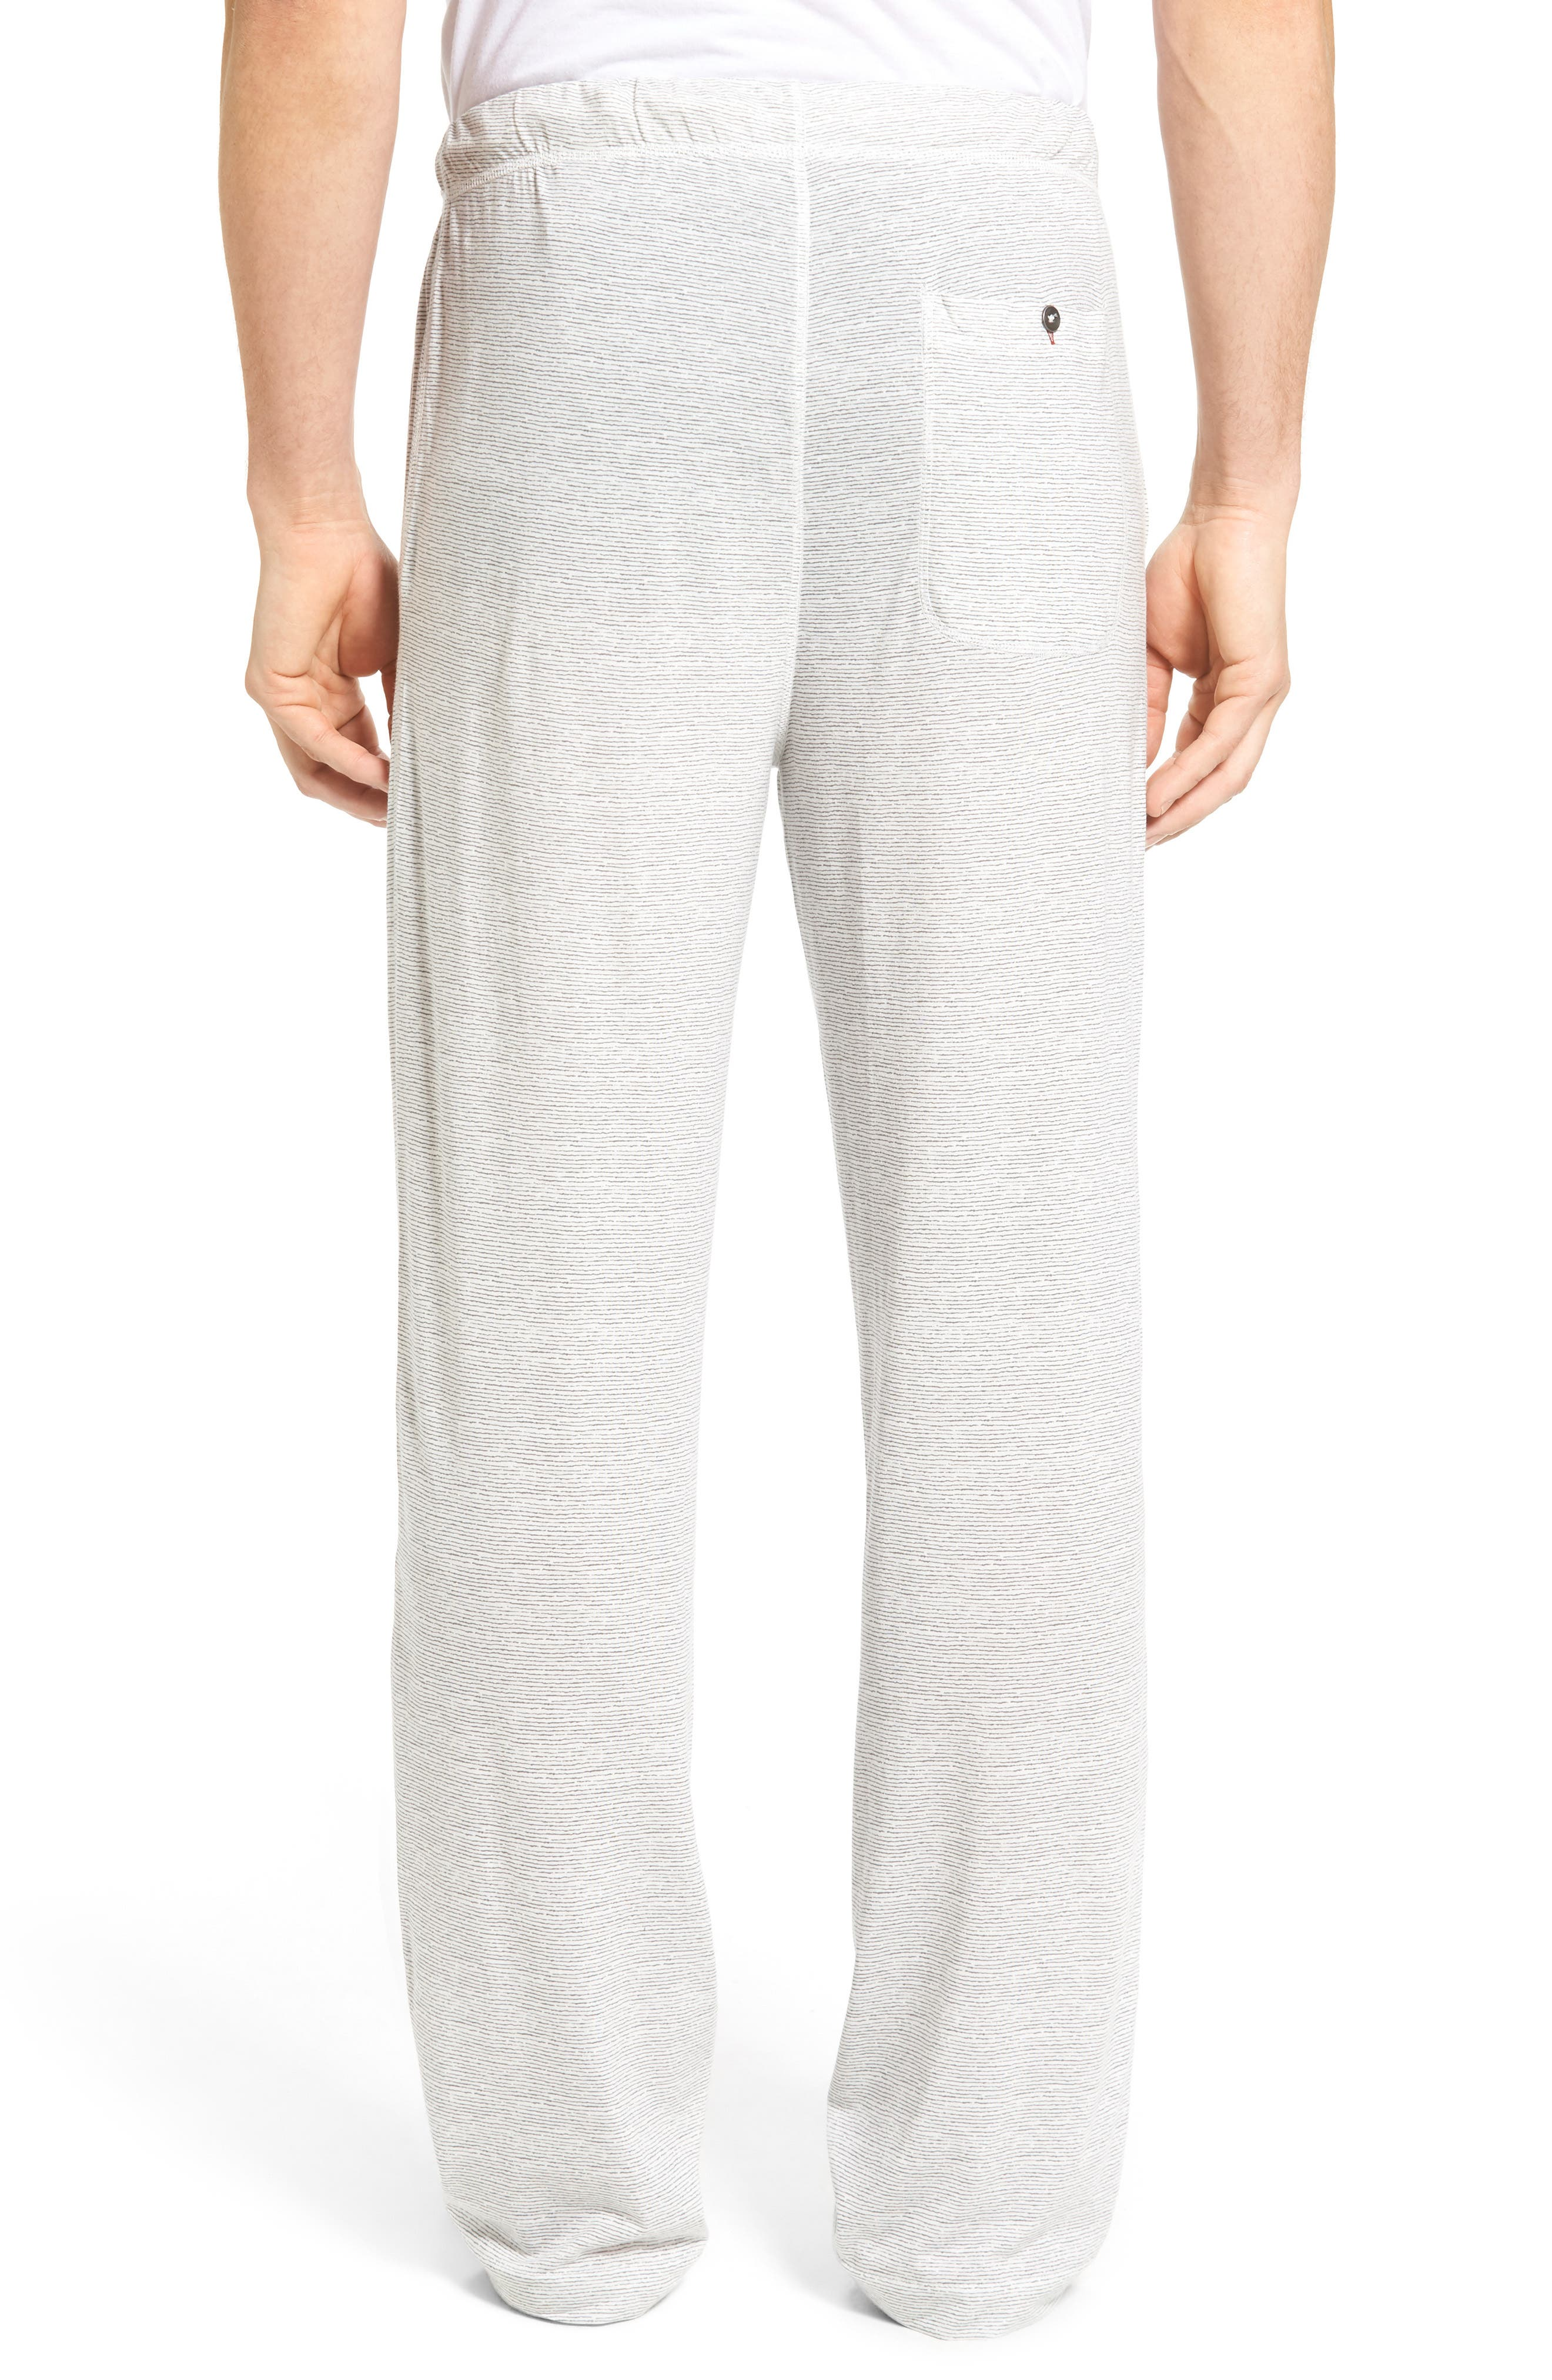 Pima Cotton & Modal Lounge Pants,                             Alternate thumbnail 2, color,                             020